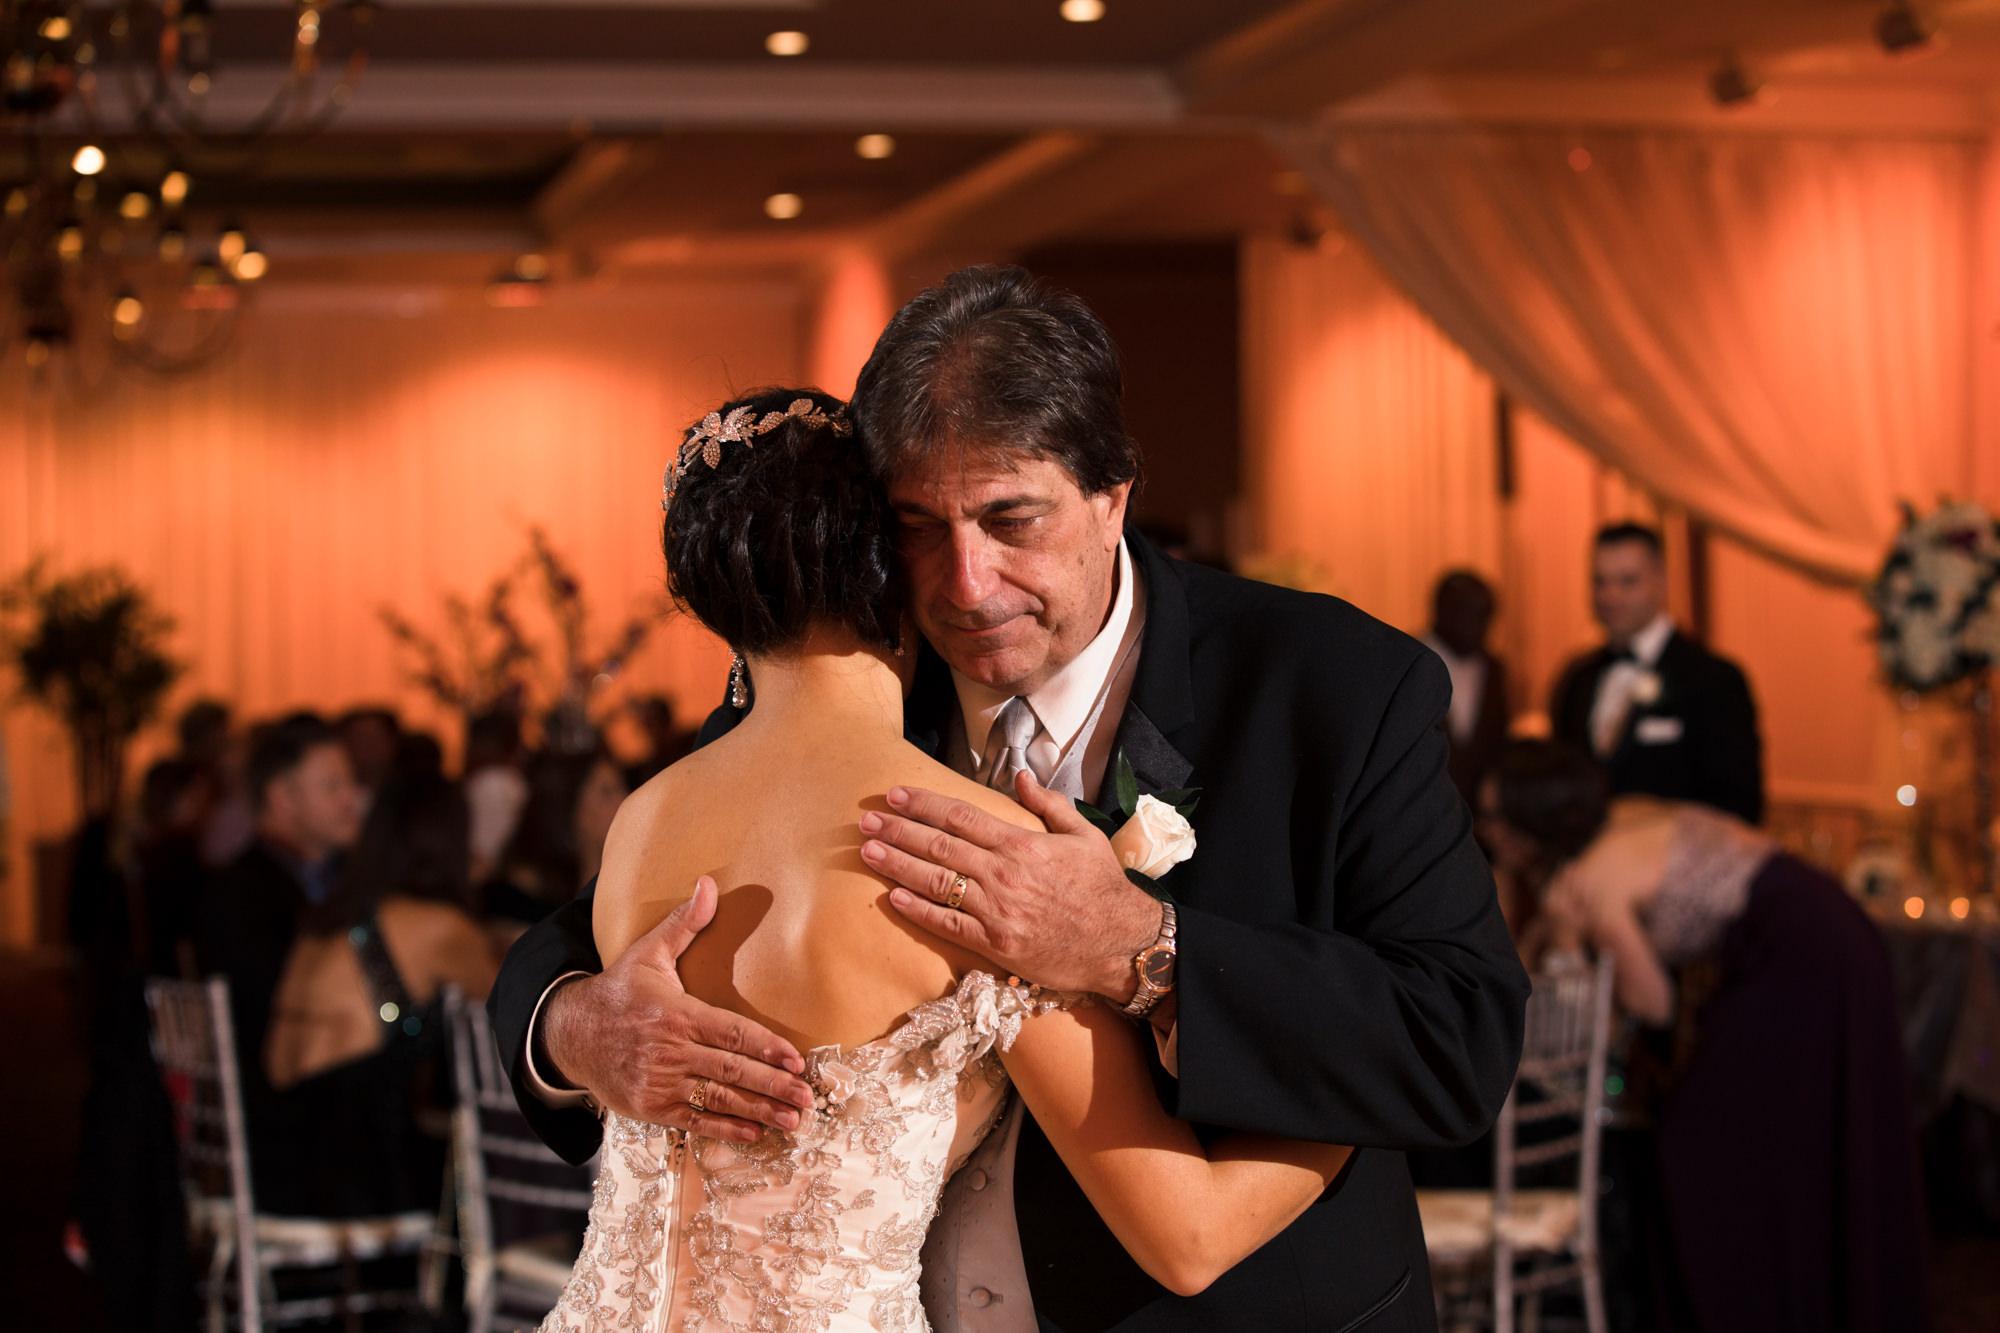 Benvenuto_Wedding_catholic_Florida_Bride-Groom-117.jpg